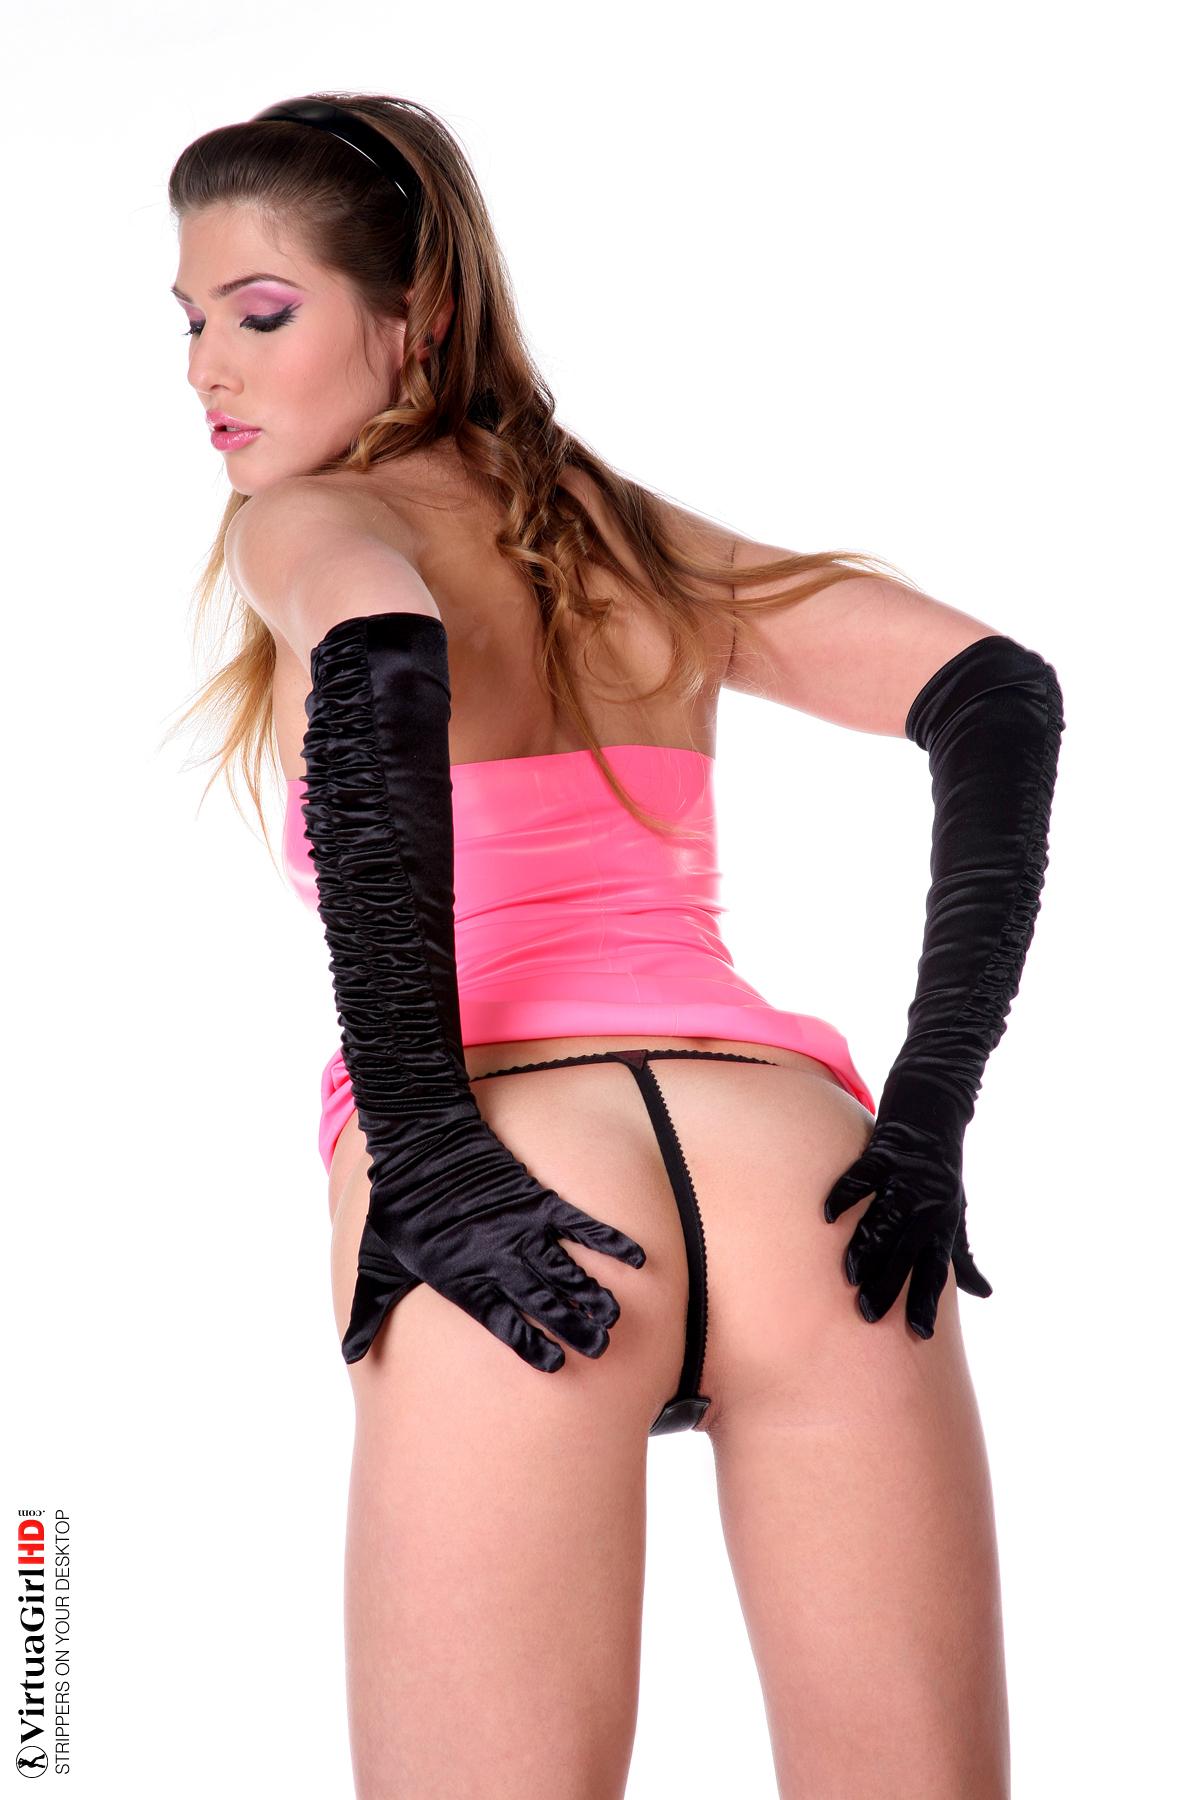 stripping girl live wallpaper